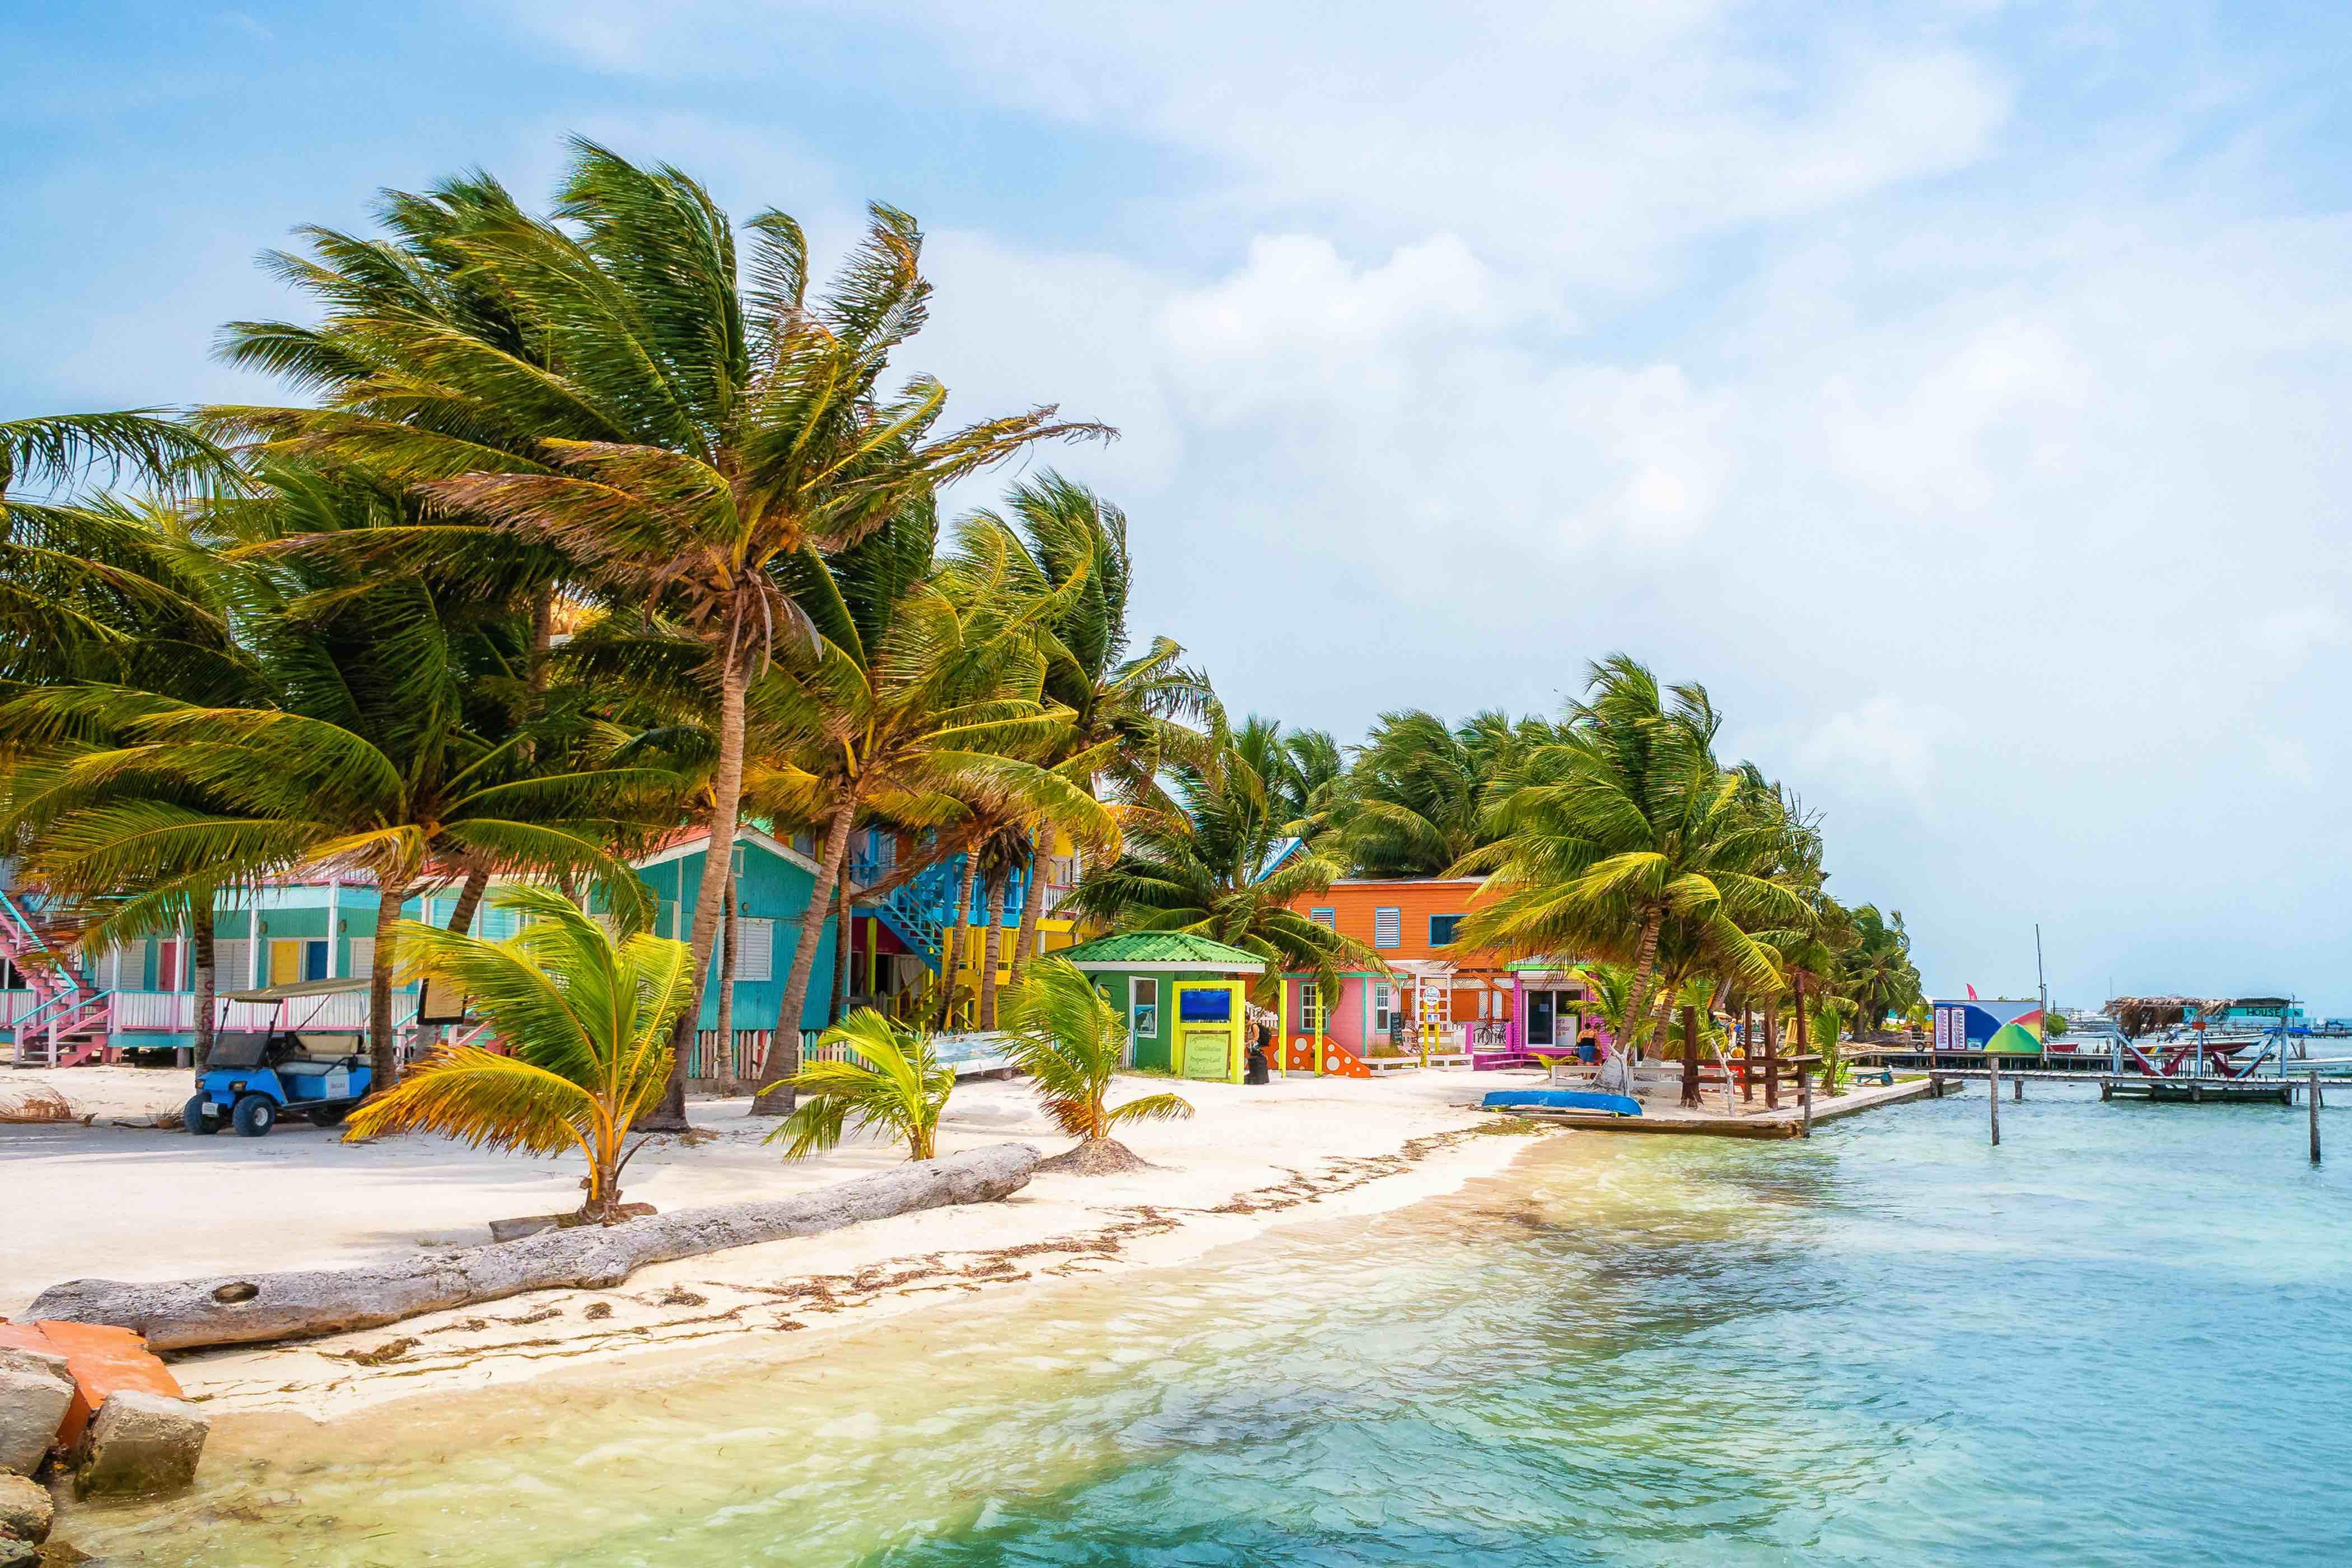 Overseas Real Estate - Belize